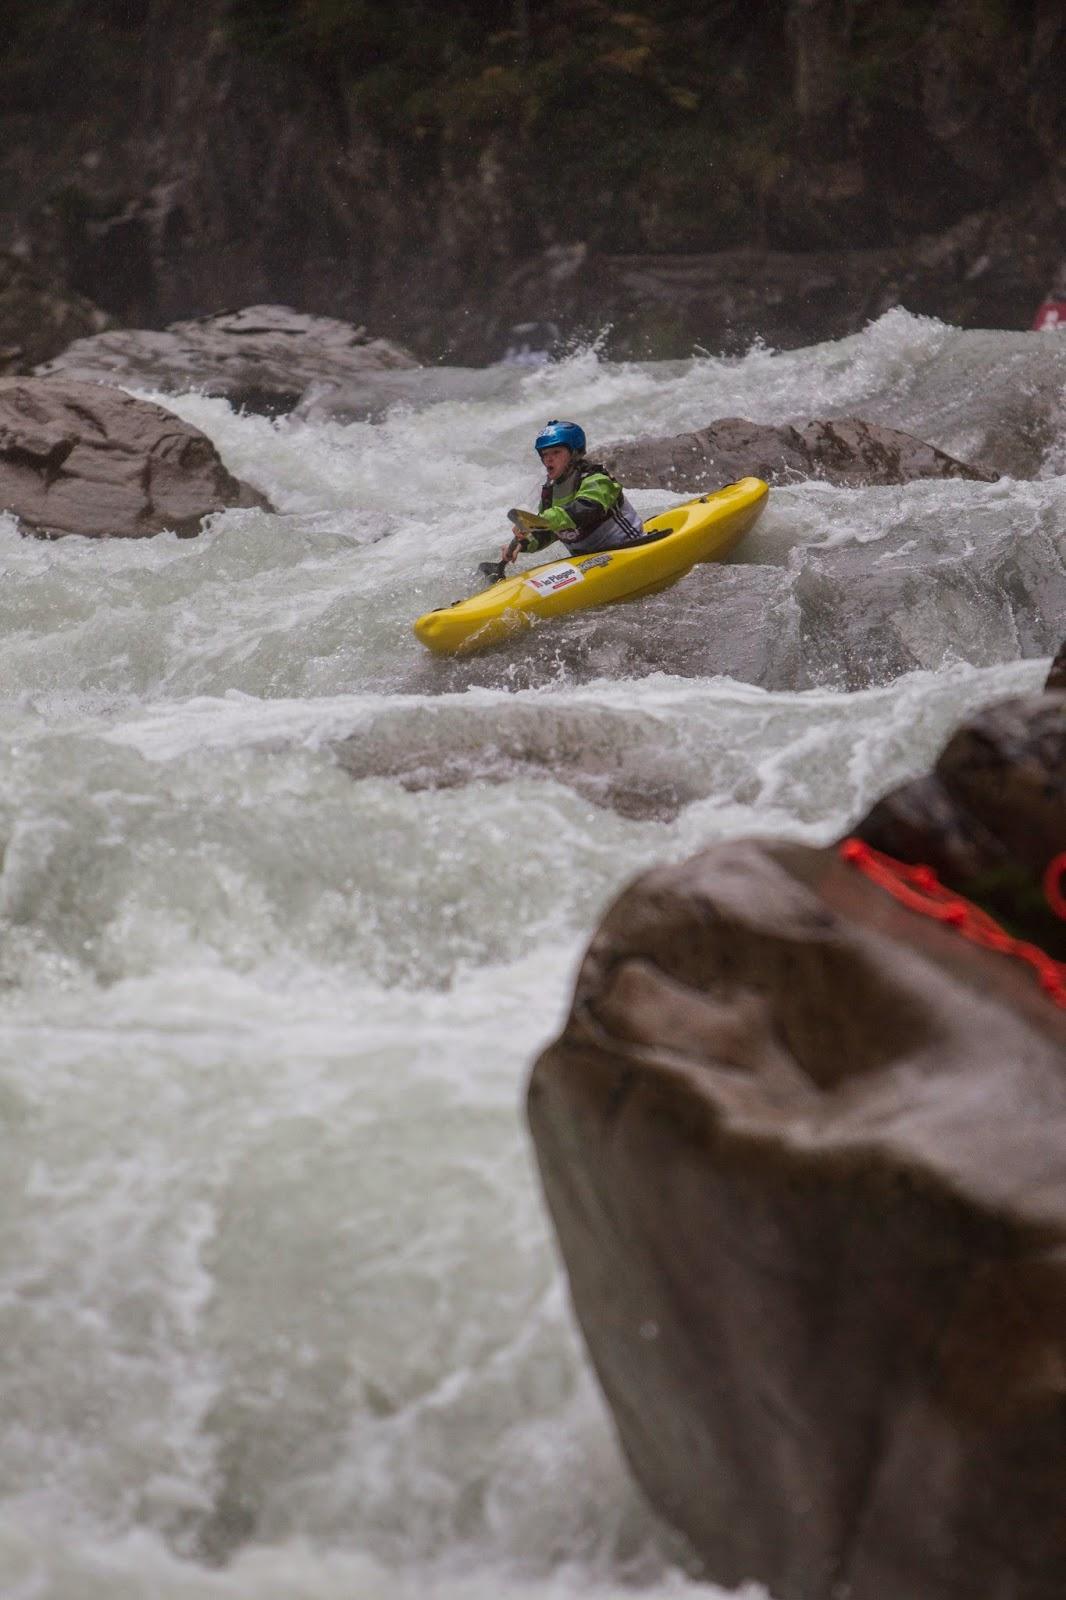 Periodo perioperatorio Acurrucarse escena  Nouria Newman: Adidas Sickline - Extreme Kayaking World Championships